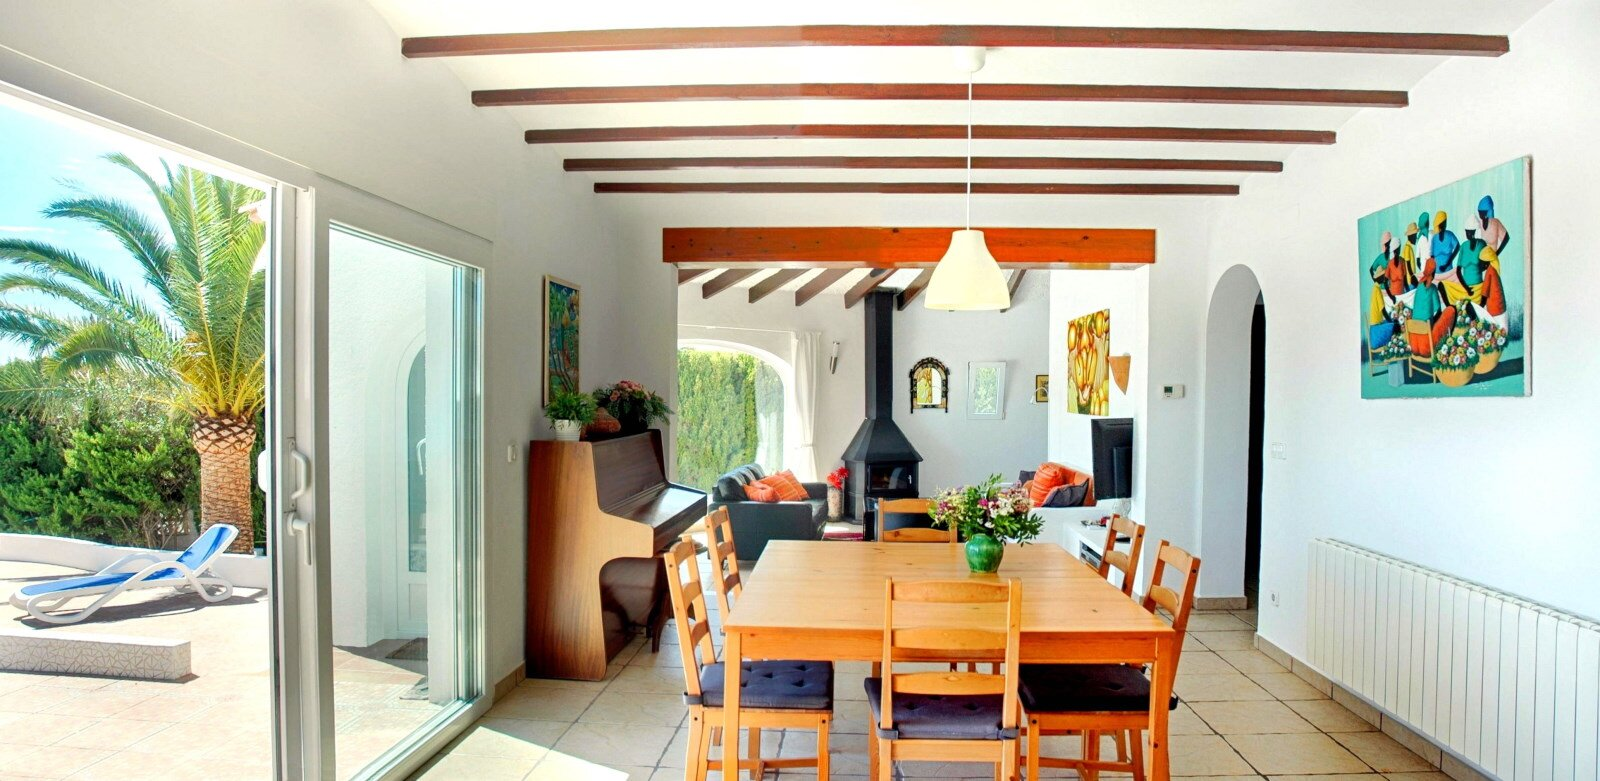 Casa Erimeli - Bad Schlafzimmer blau